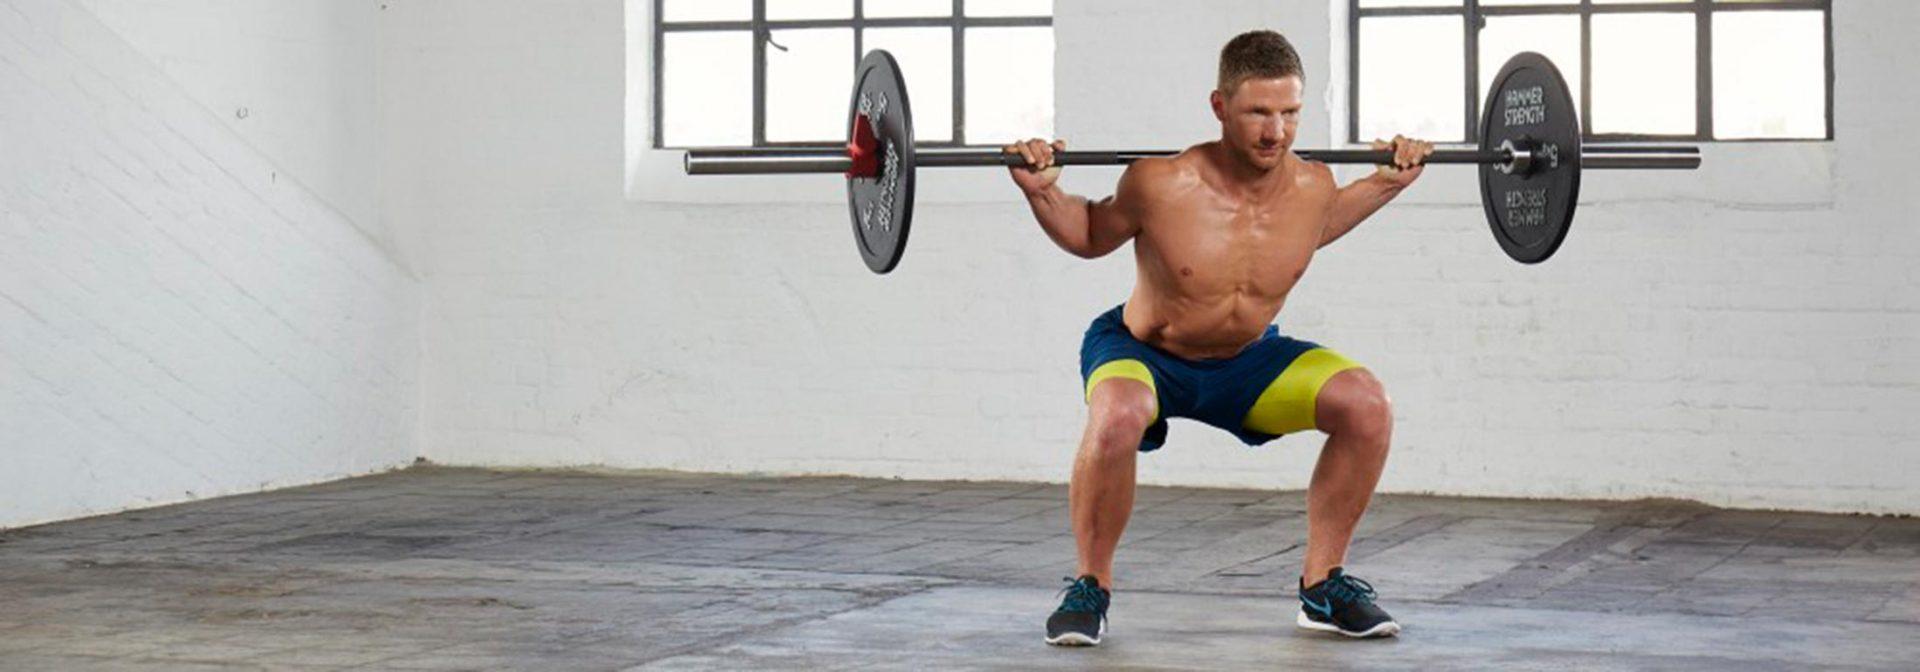 Muskelaufbau Übungen Kniebeuge